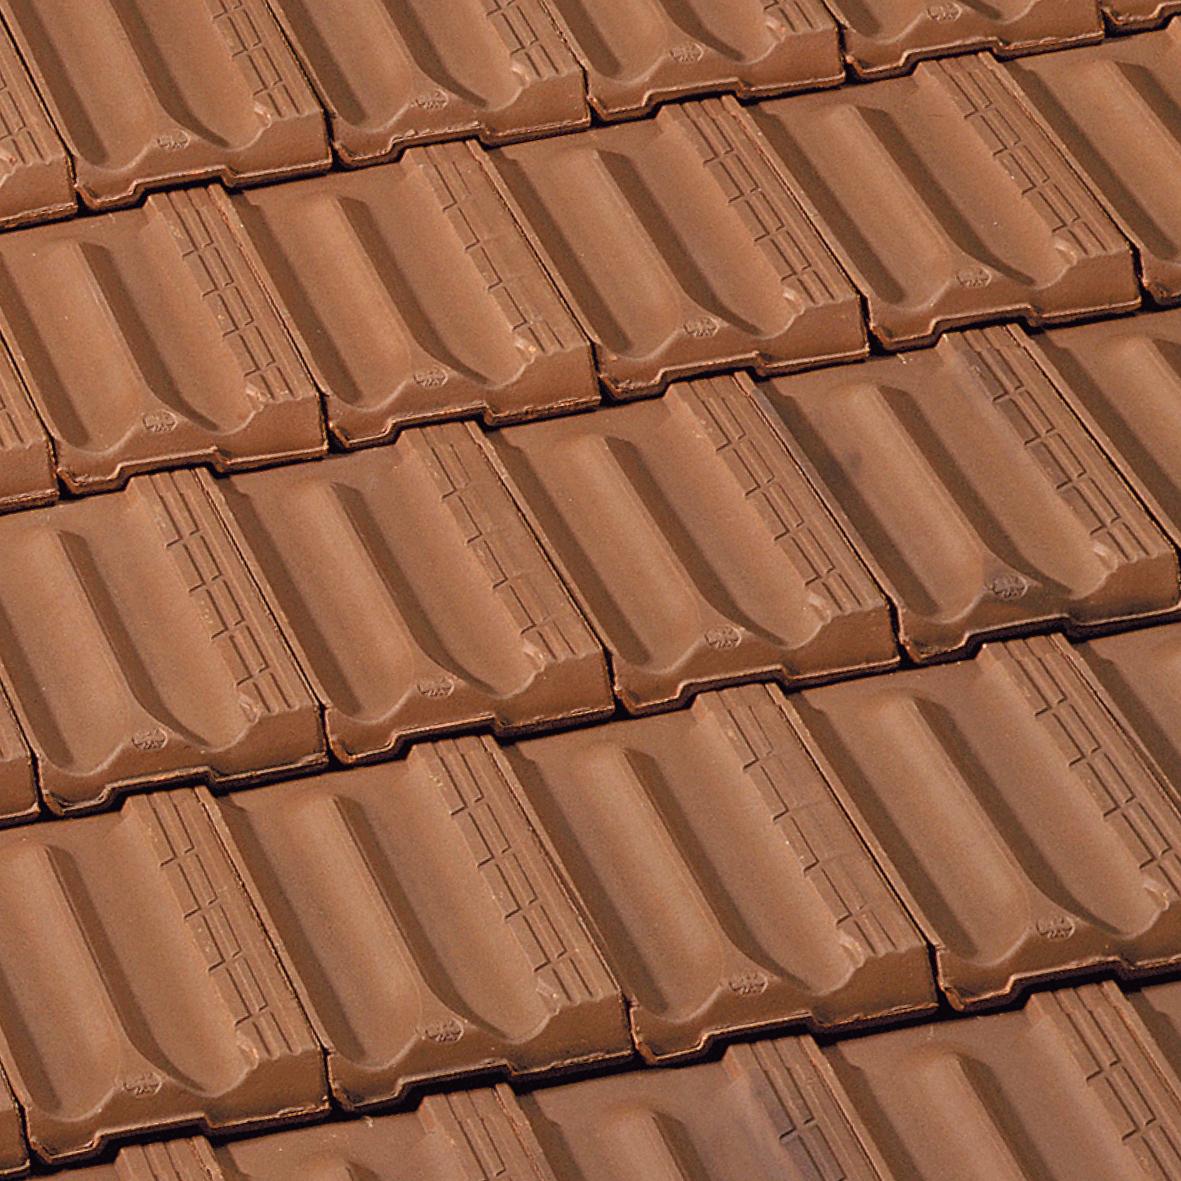 Marseille onhausonhaus - Clases de tejas para tejados ...